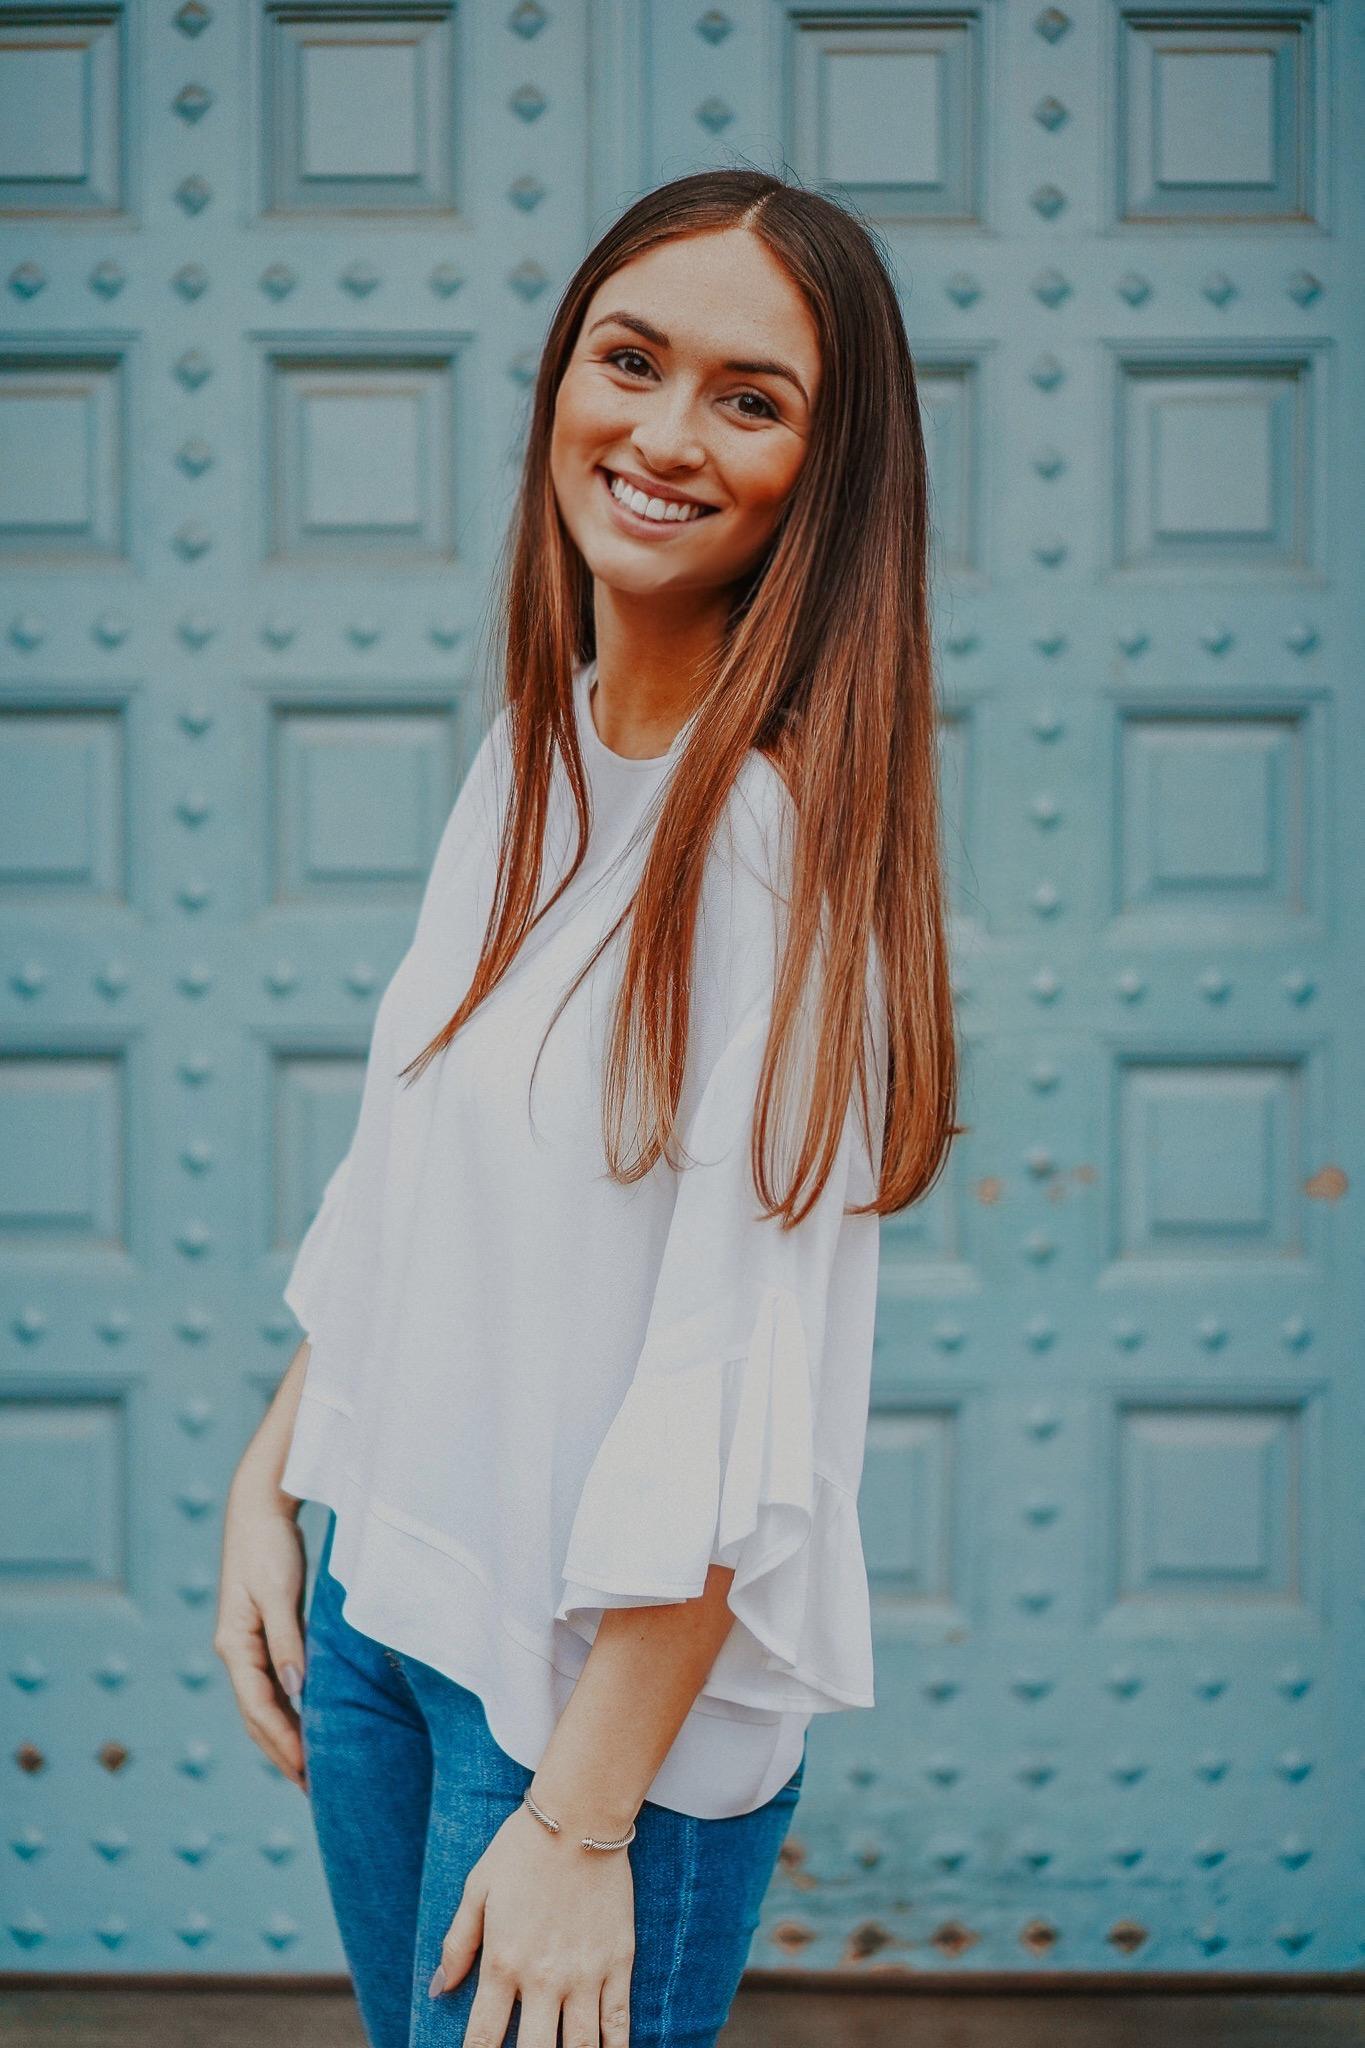 Hannah Reasoner